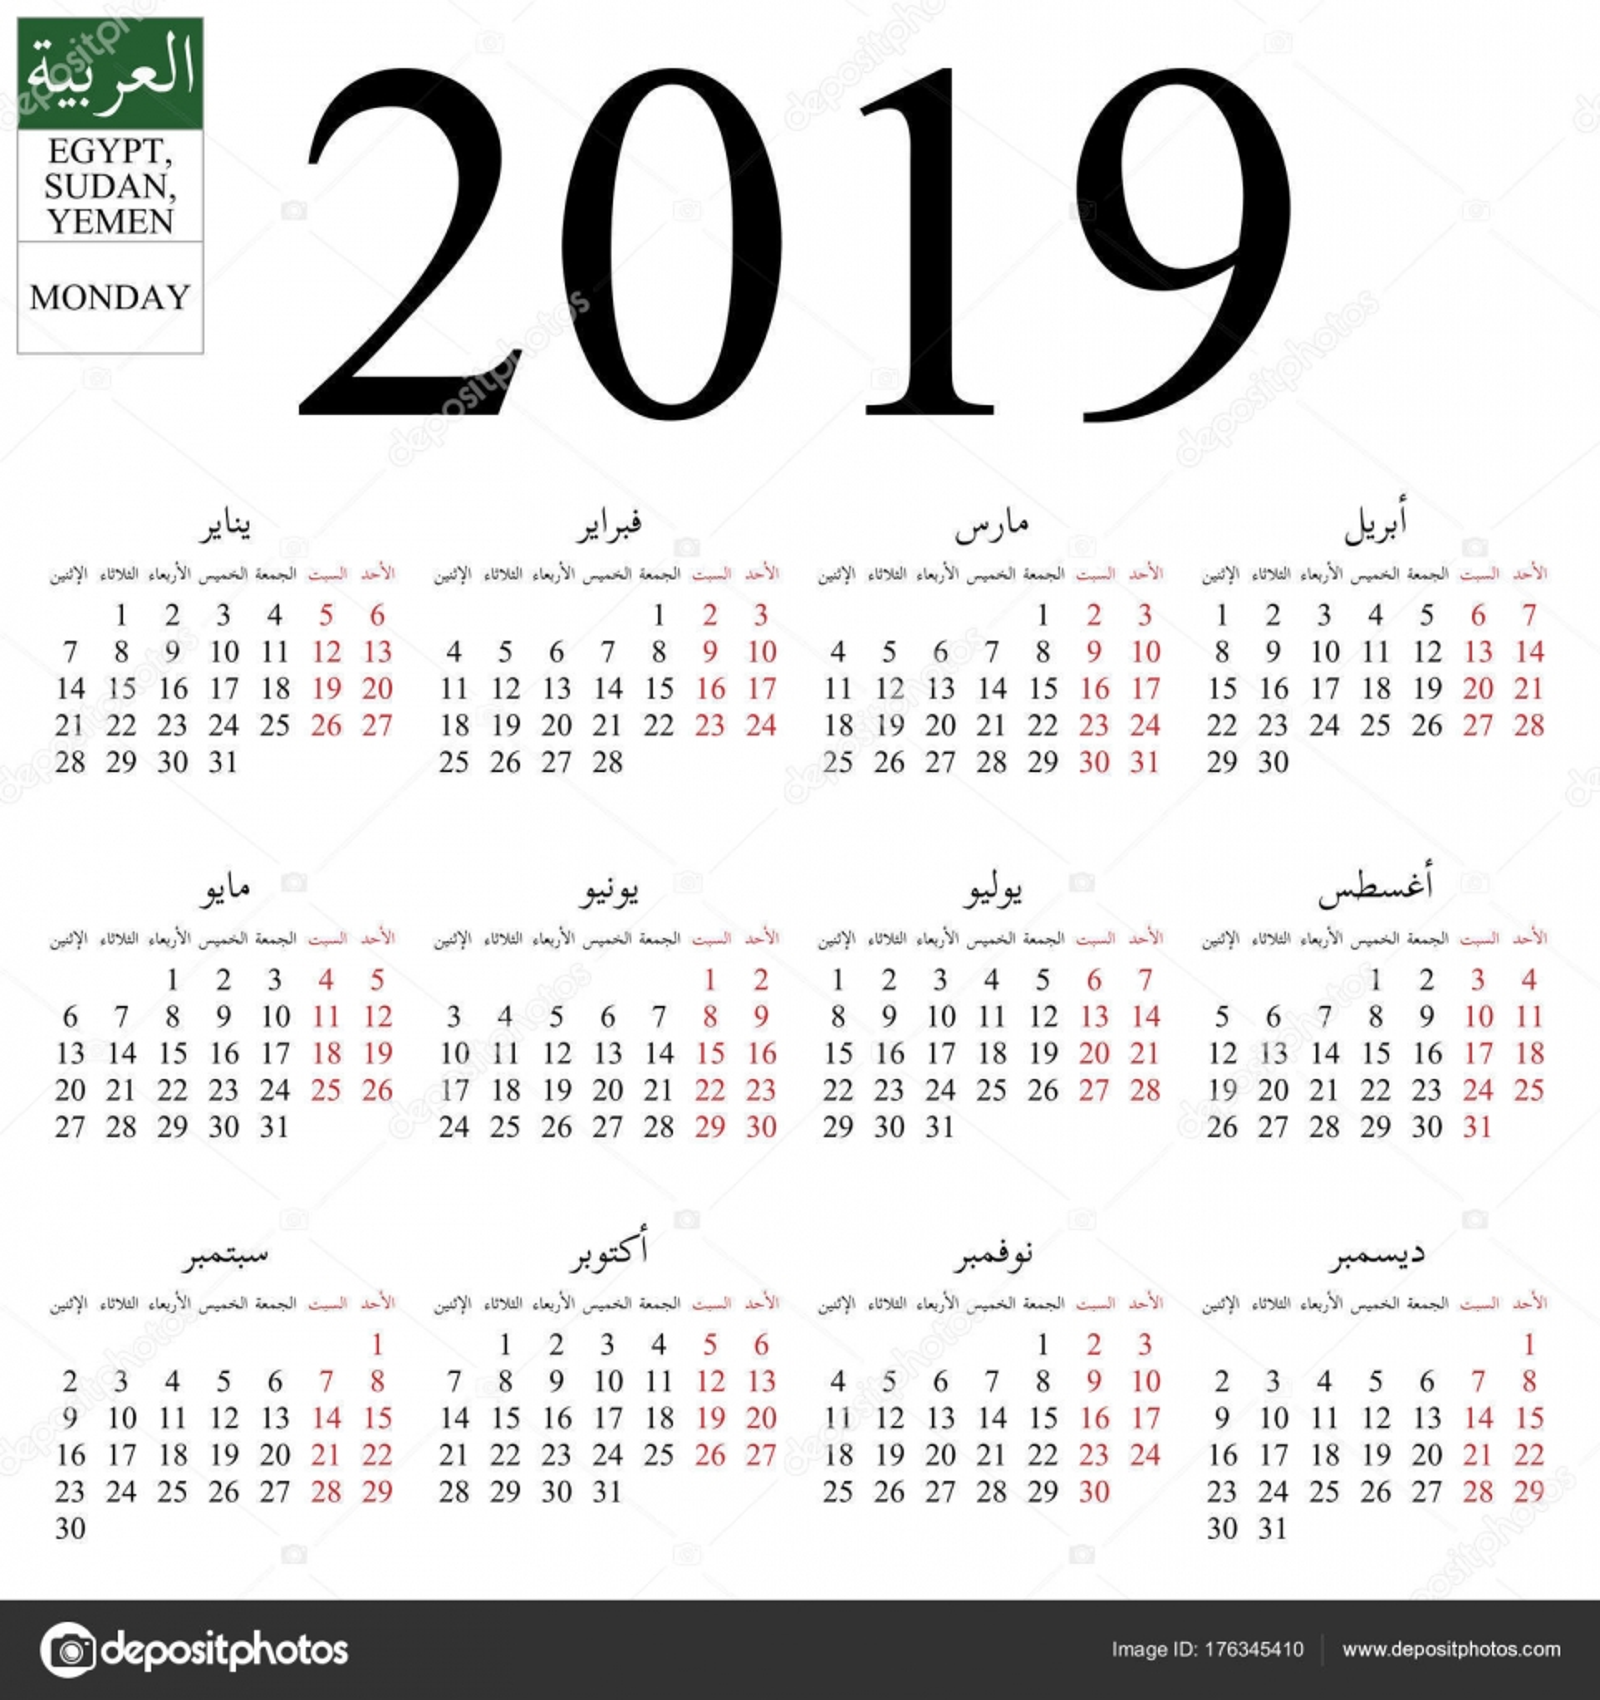 naptár 2019 nevekkel Naptár 2019, Arab, hétfő — Stock Vektor © Dmitry_Guzhanin #176345410 naptár 2019 nevekkel